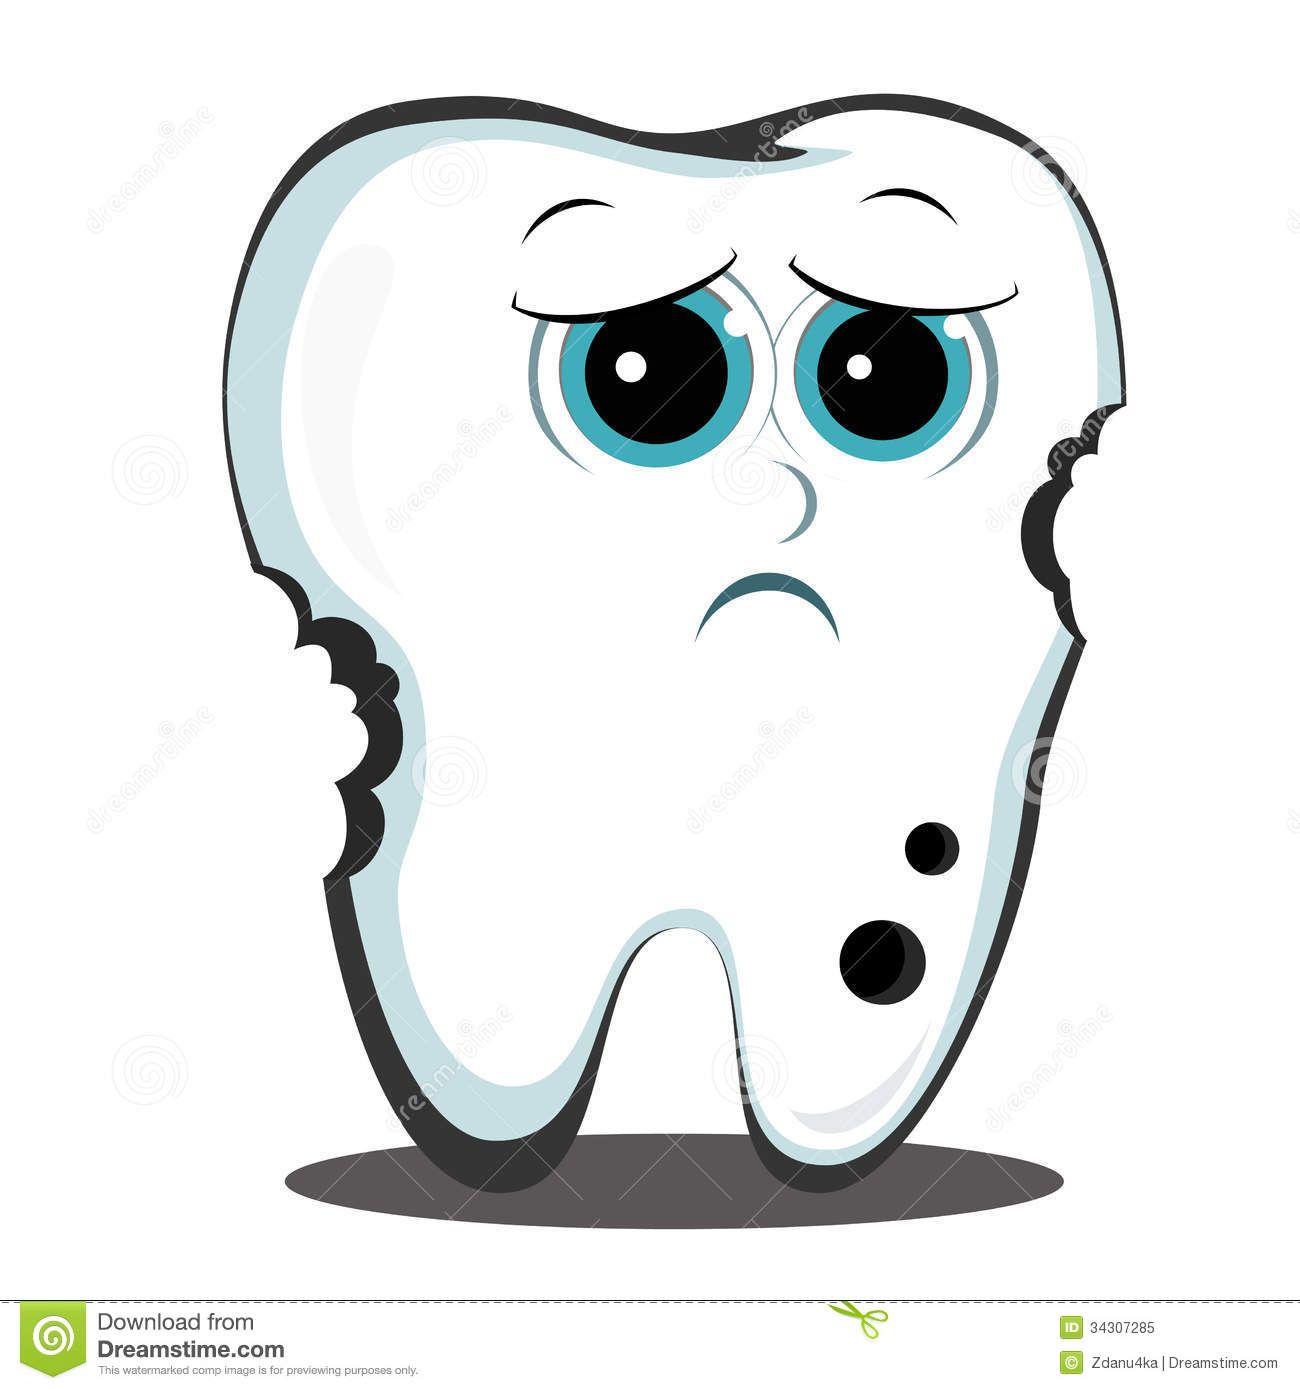 Cartoon tooth cavity stock. Dentist clipart dental caries